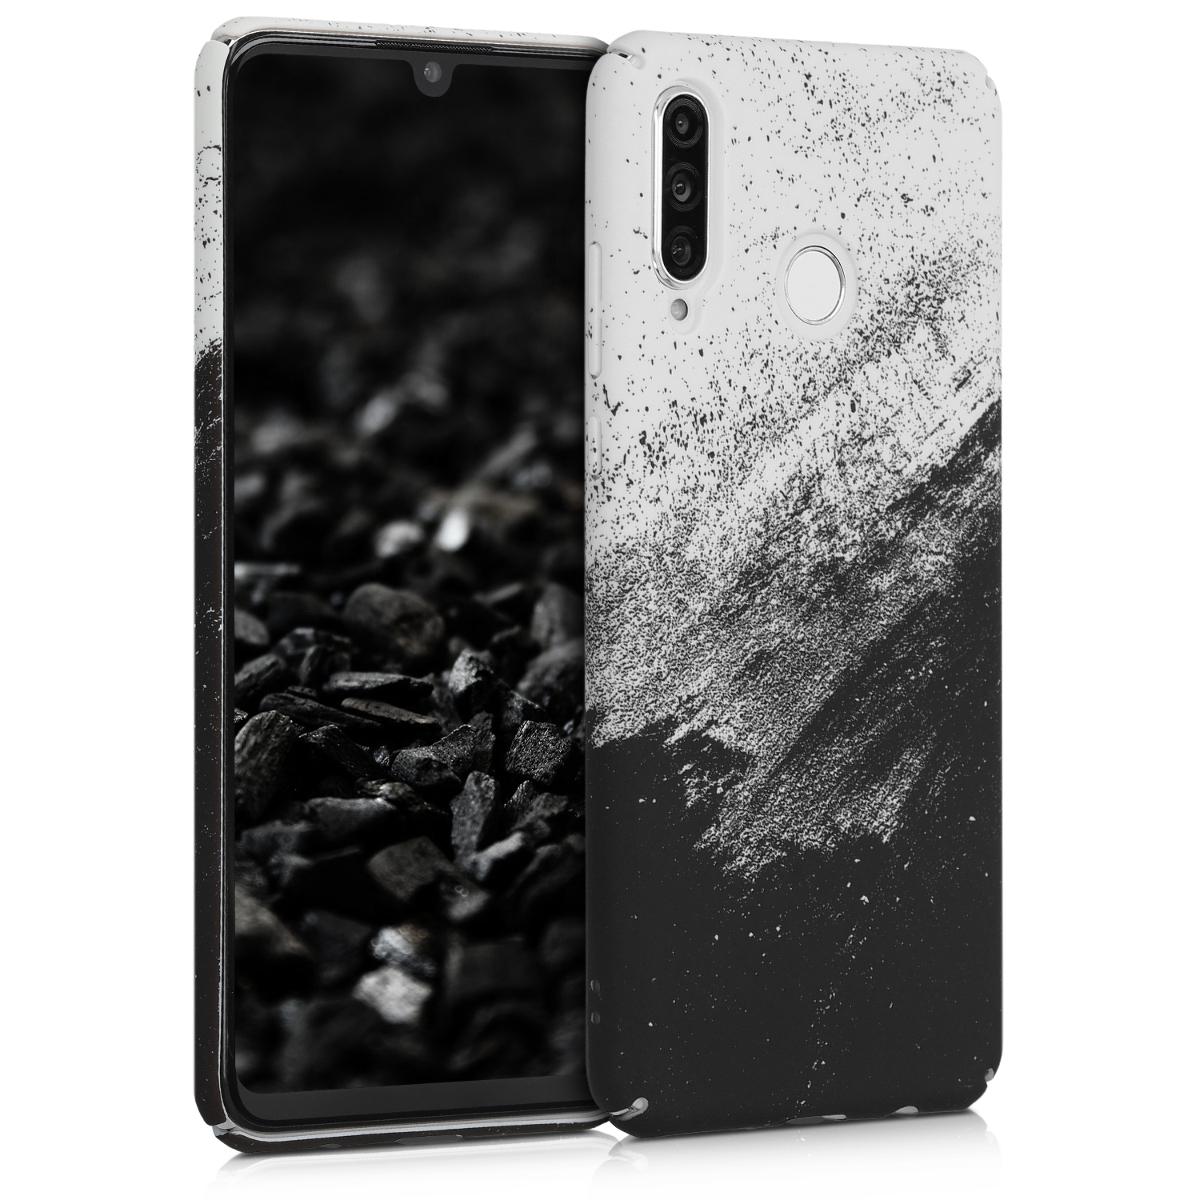 KW Σκληρή Θήκη Huawei P30 Lite - Black / White (49335.01)